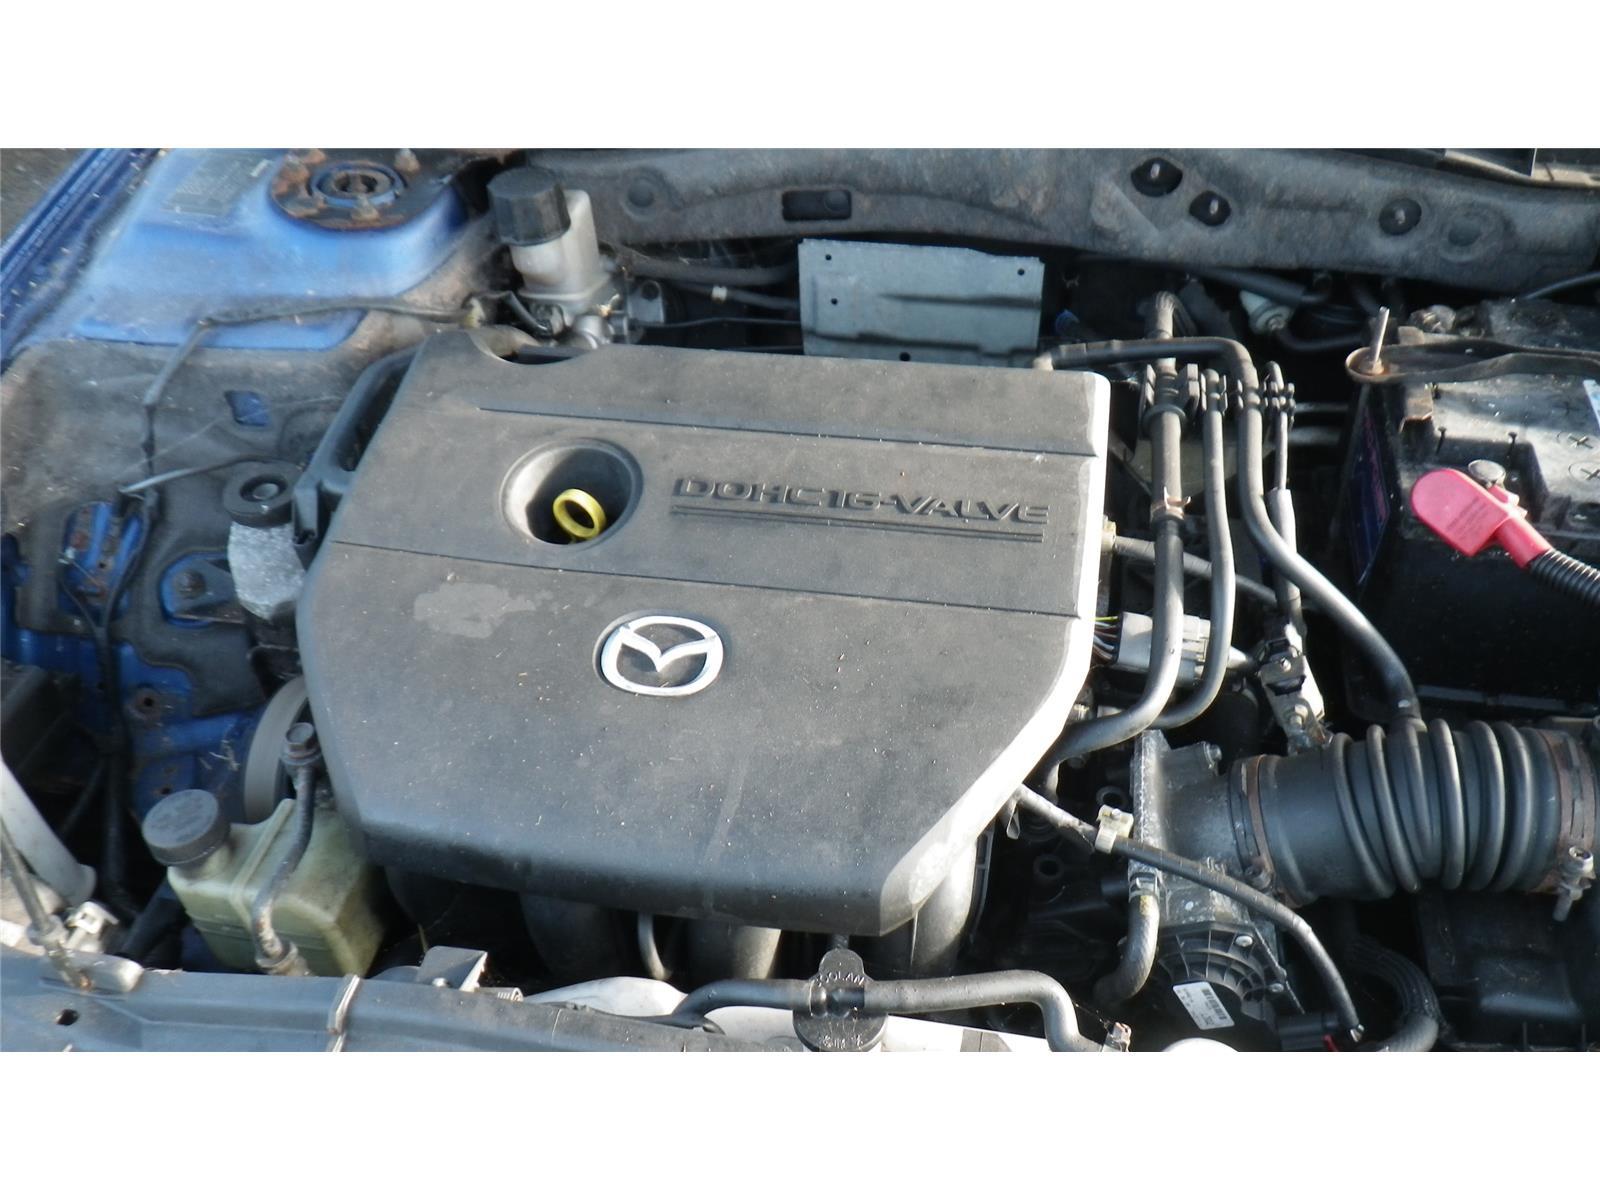 2005 Mazda 6 2002 To 2007 5 Door Hatchback Petrol Manual Engine Parts Diagram